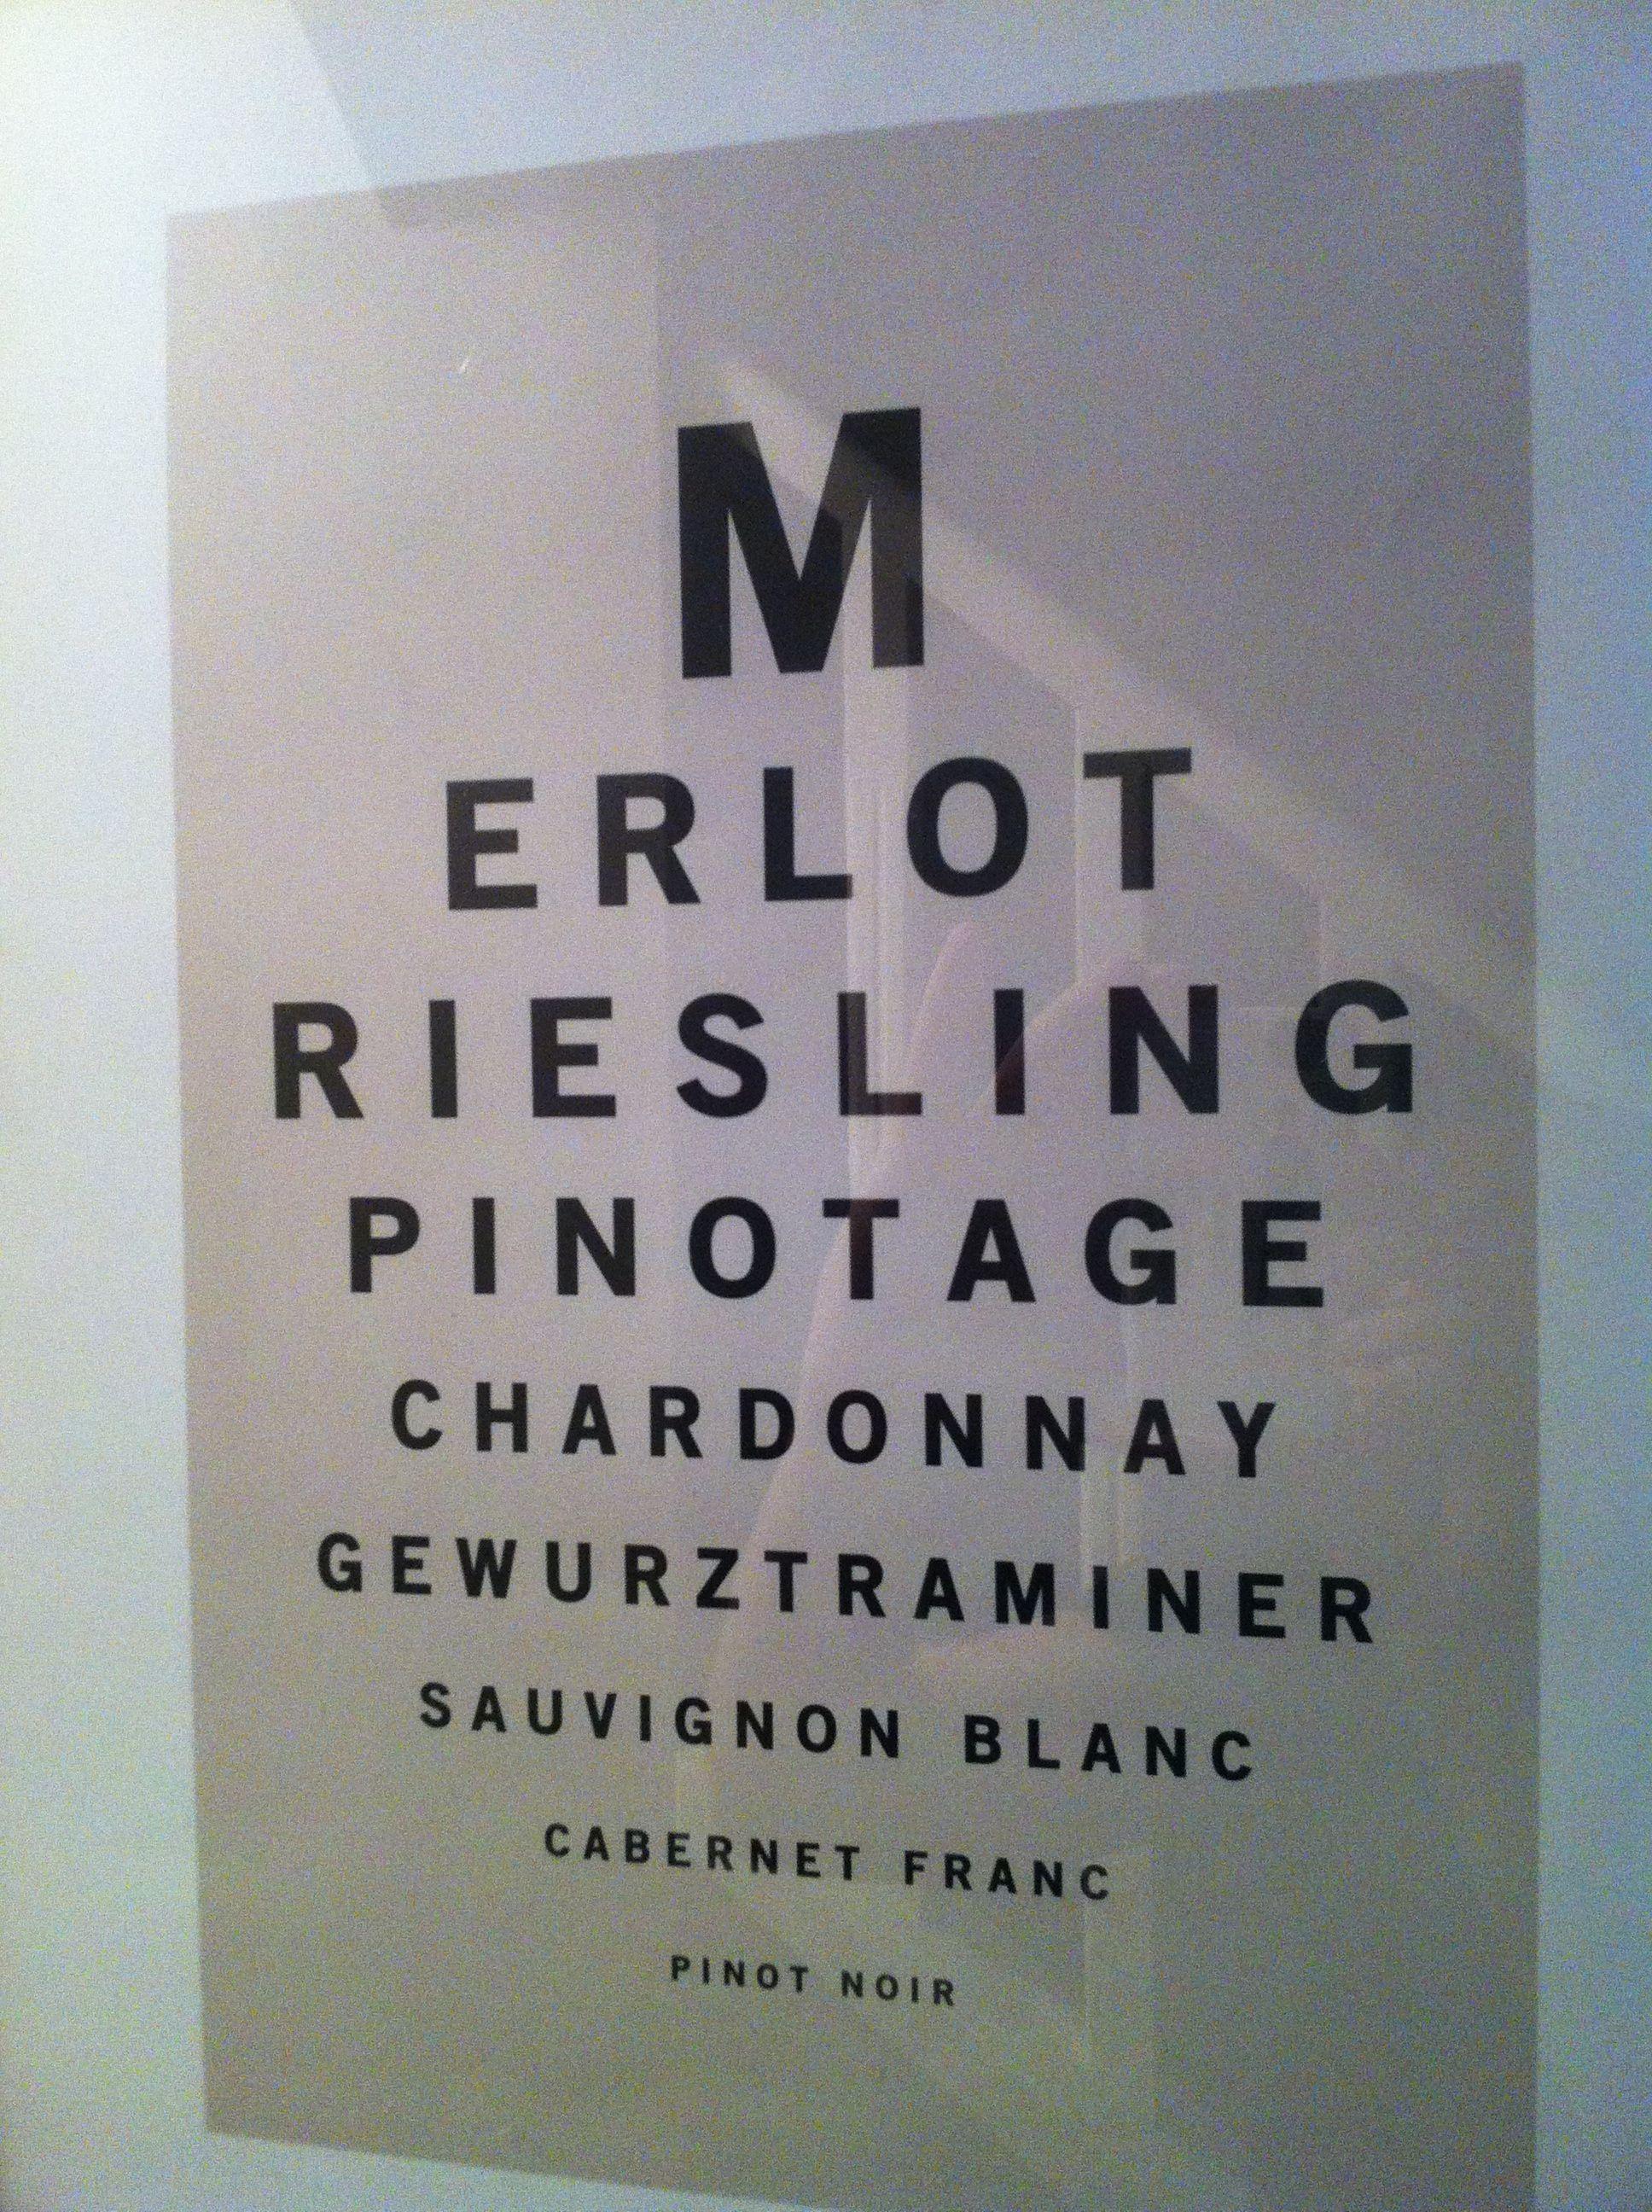 Now thats an eye chart gewurztraminer should have been the last now thats an eye chart gewurztraminer should have been the last line geenschuldenfo Gallery